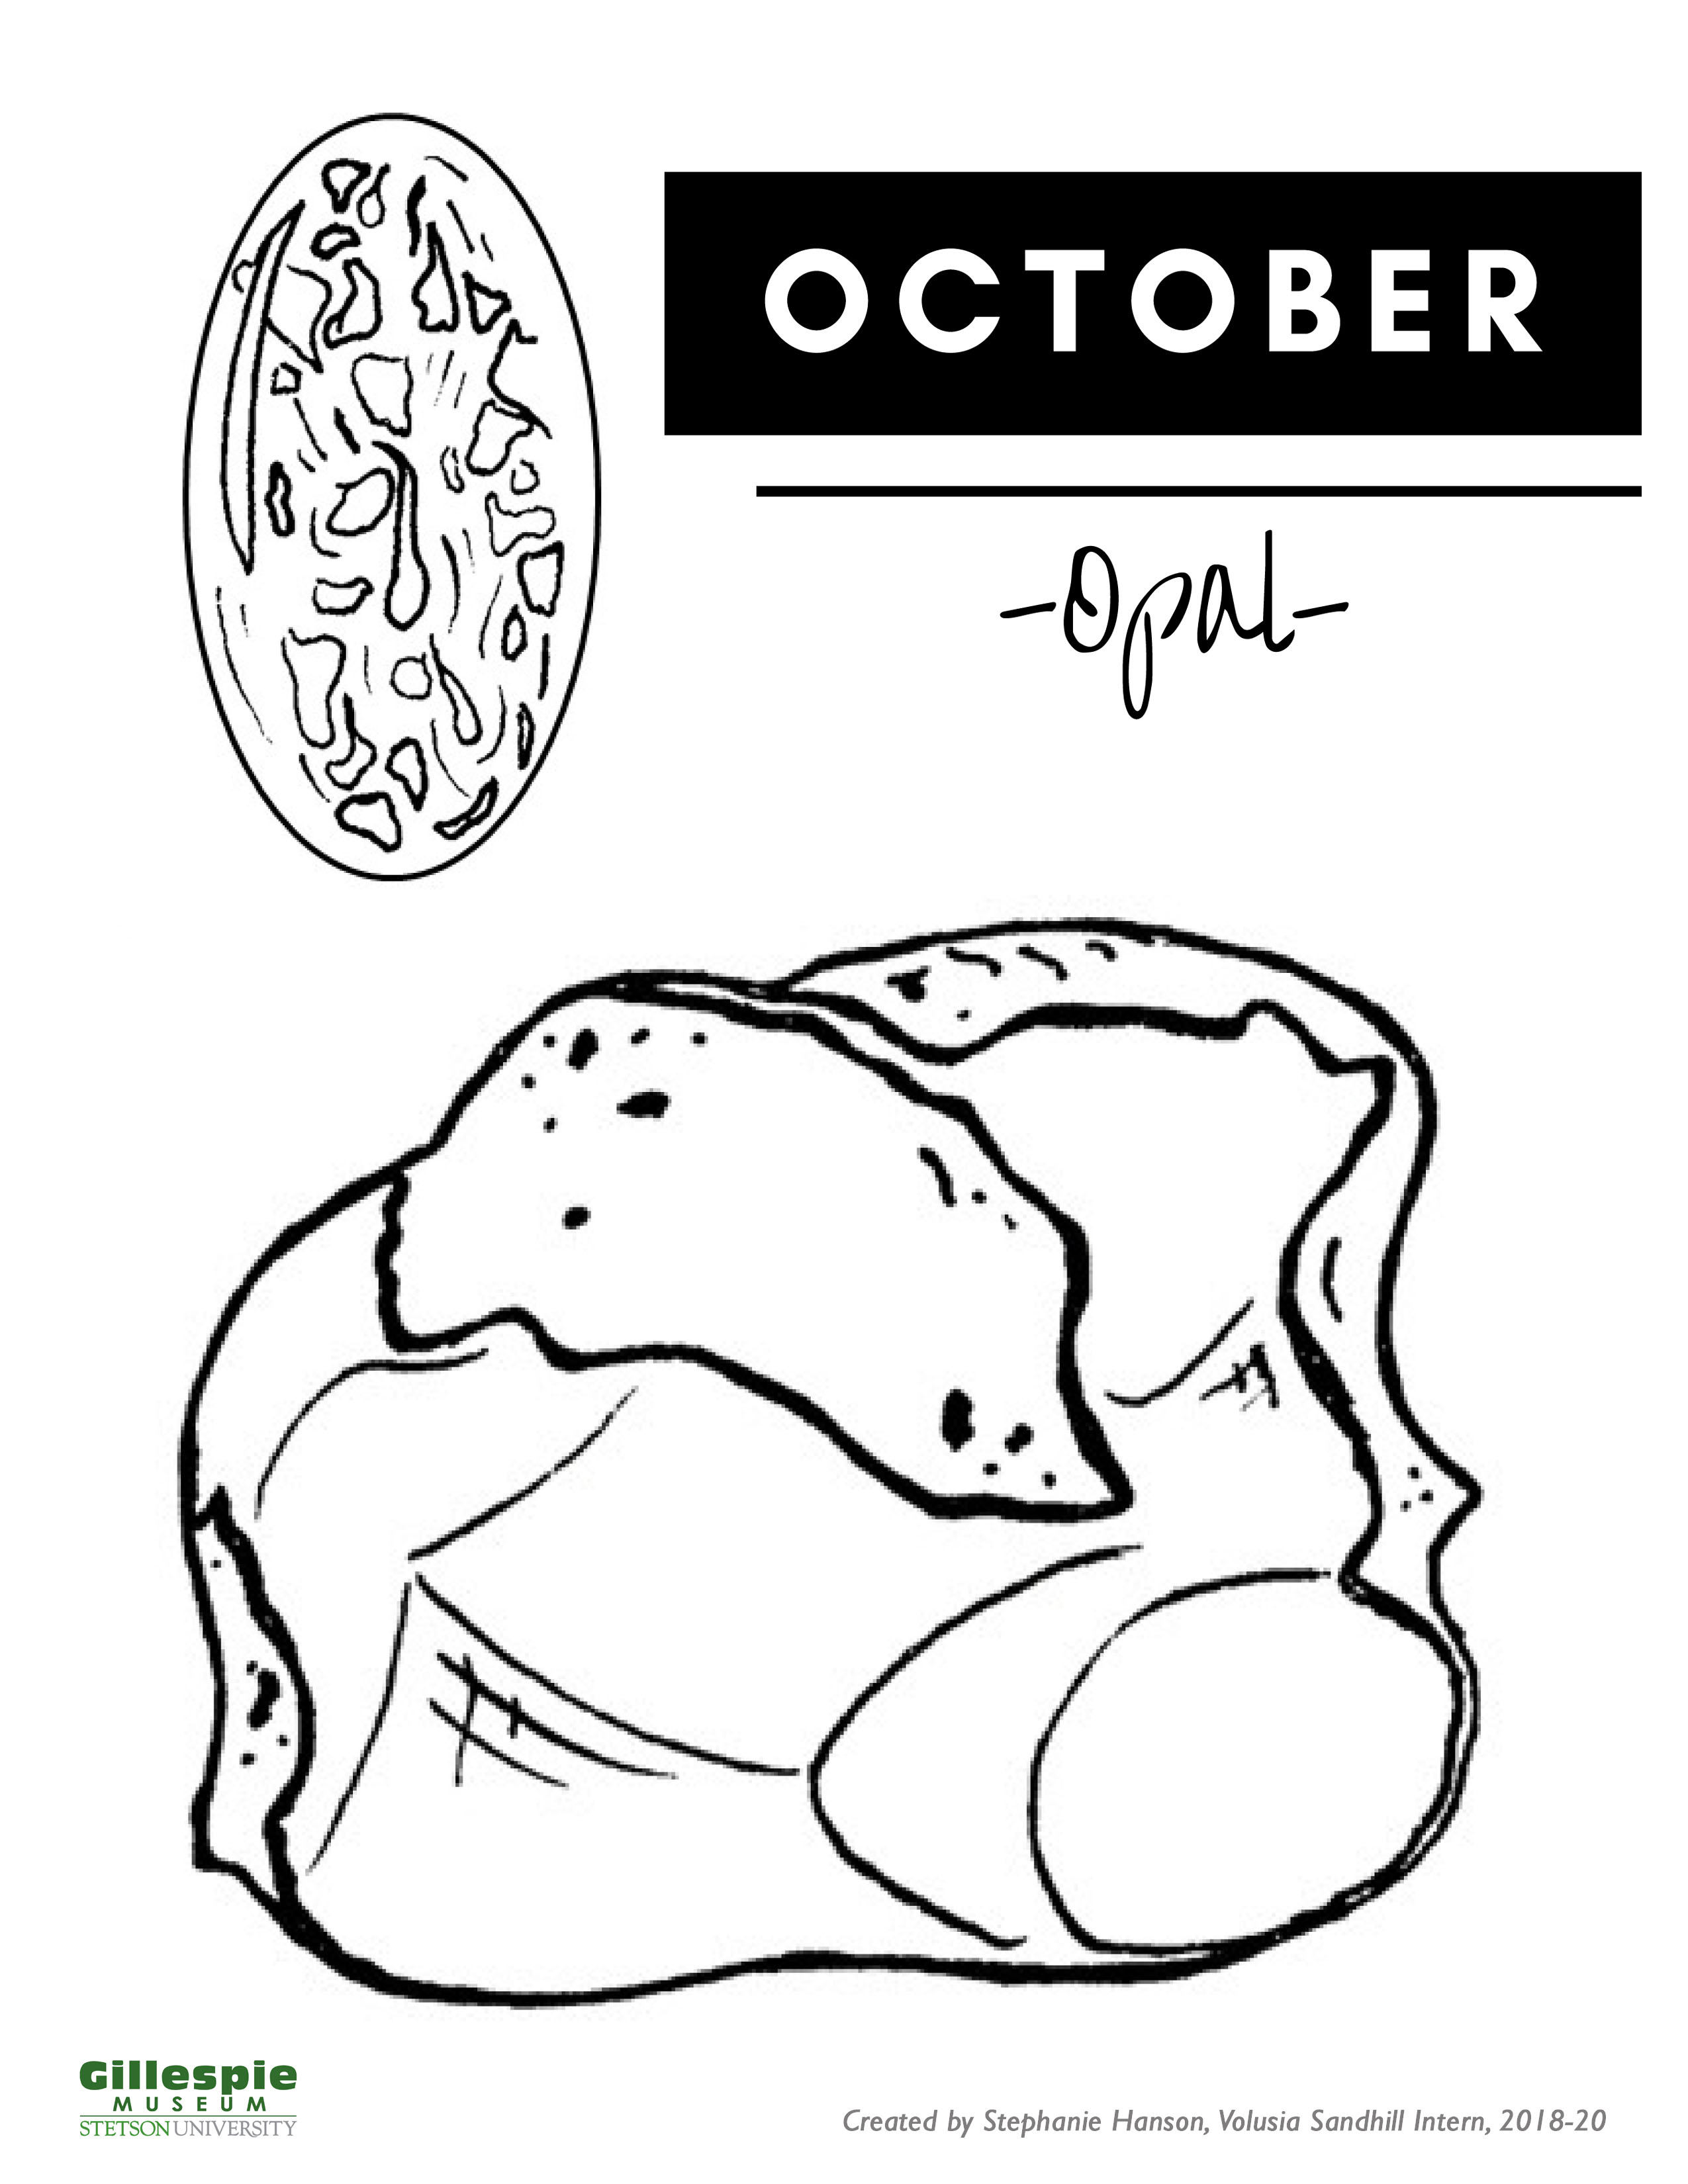 October birthstone